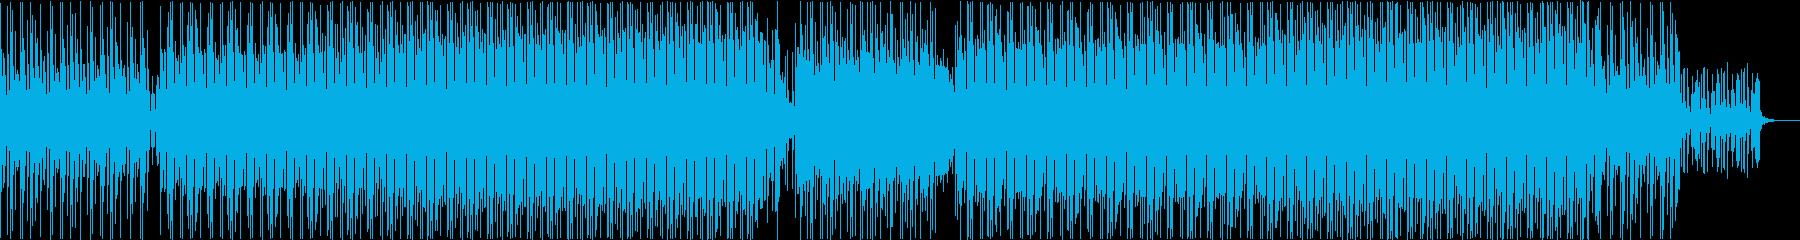 Explorationの再生済みの波形